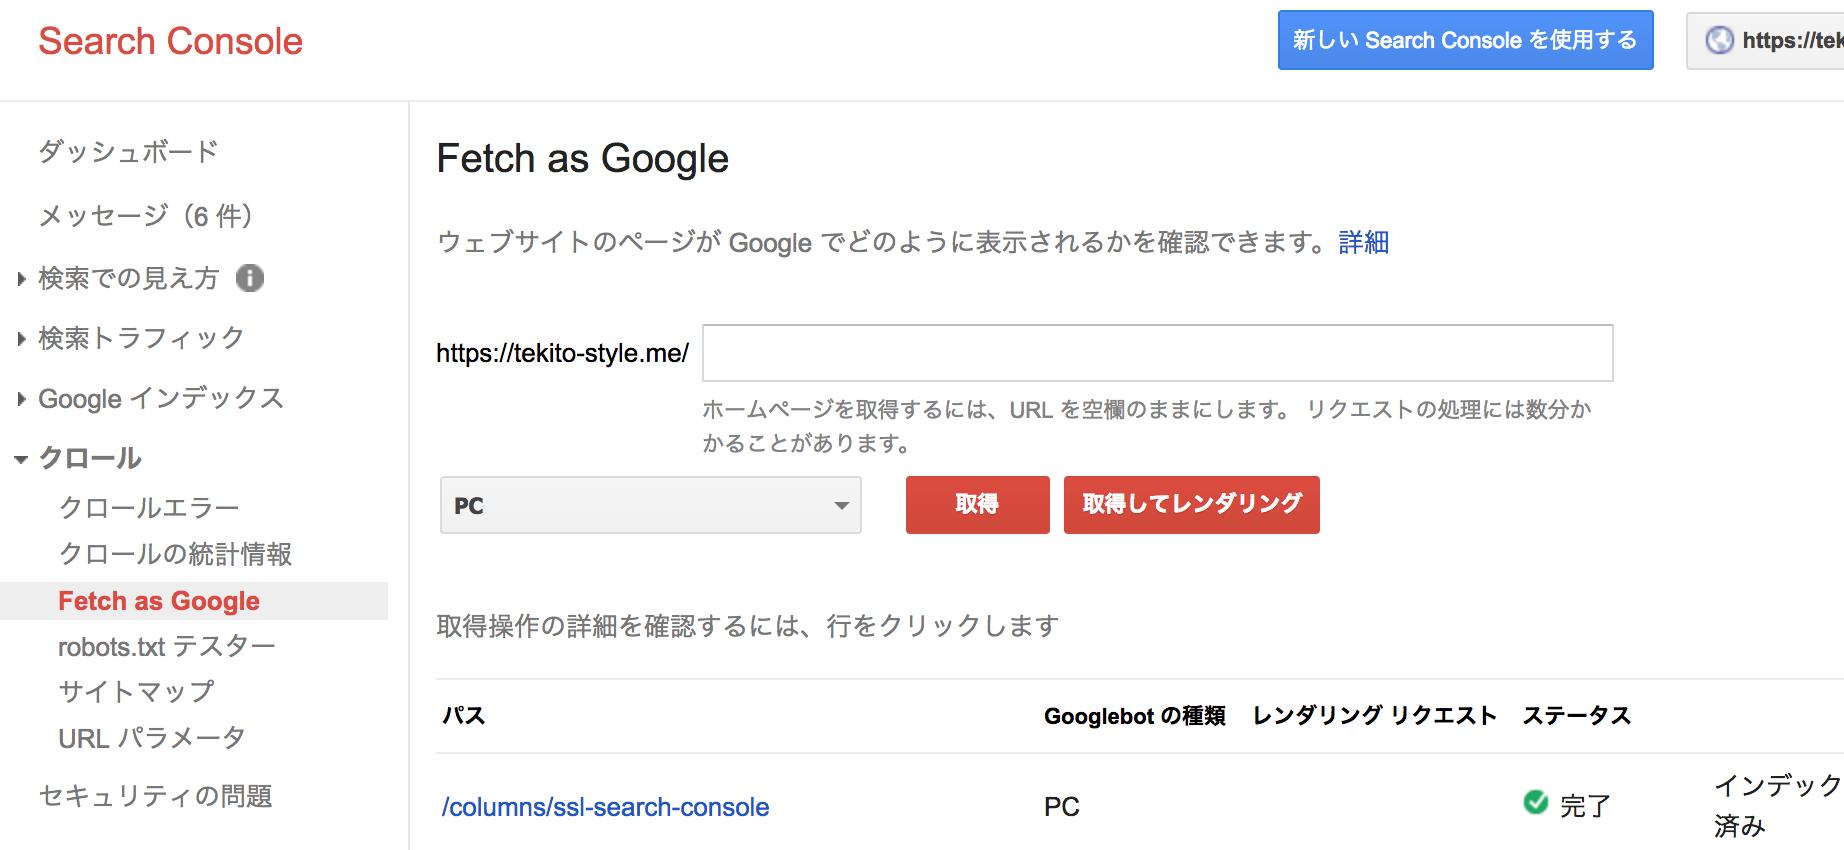 Search Console でFech as Google